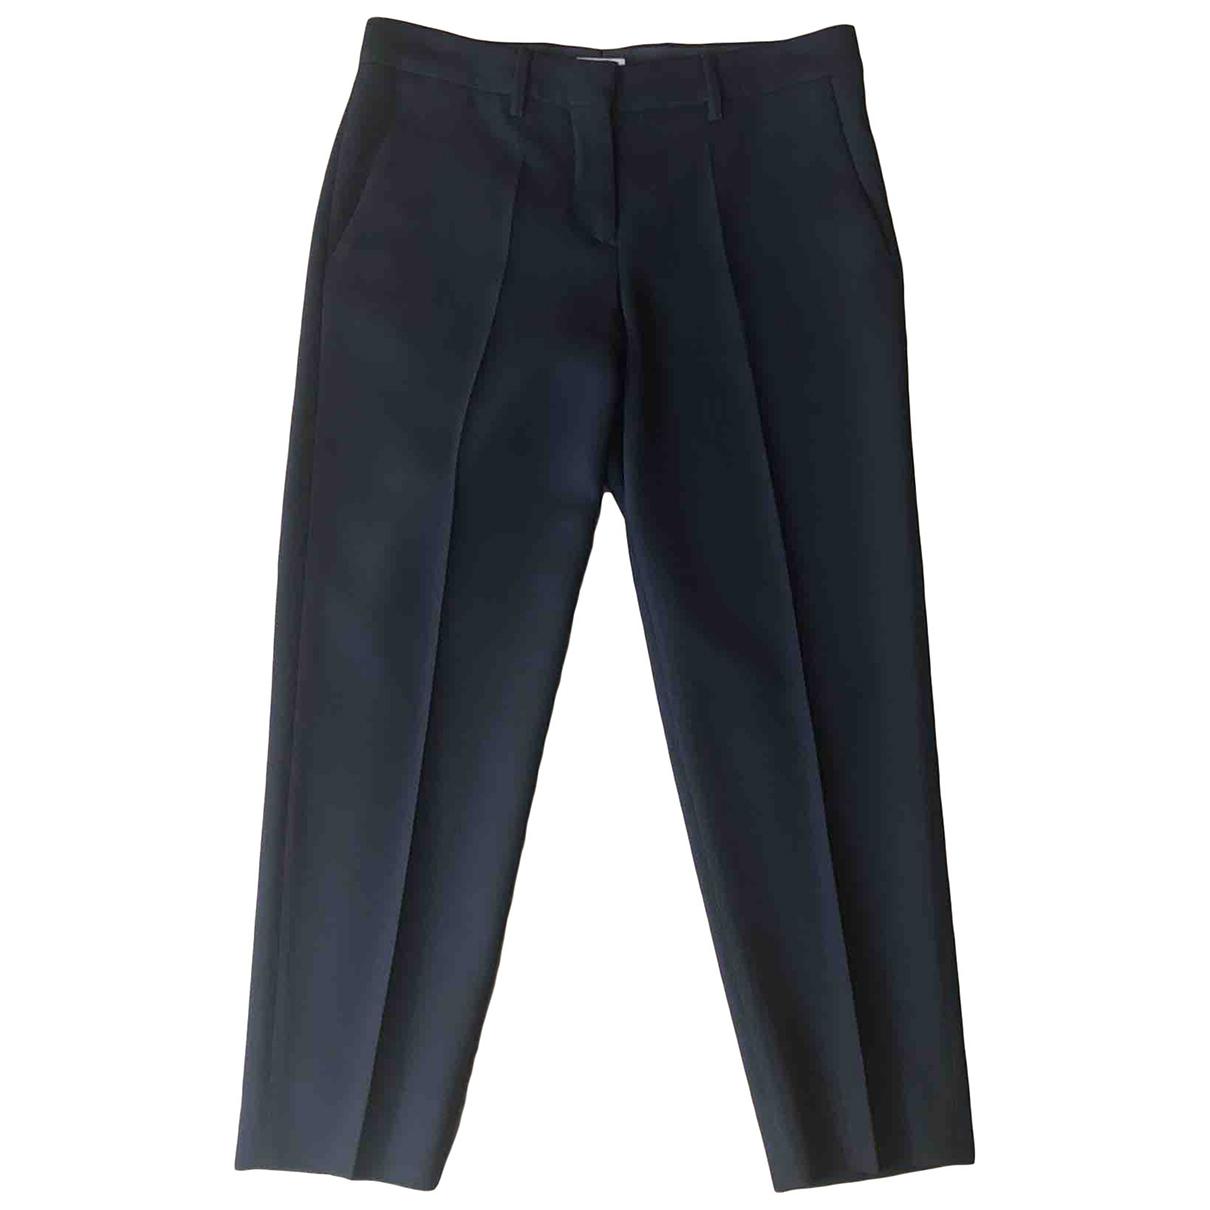 Miu Miu \N Black Wool Trousers for Women 40 IT